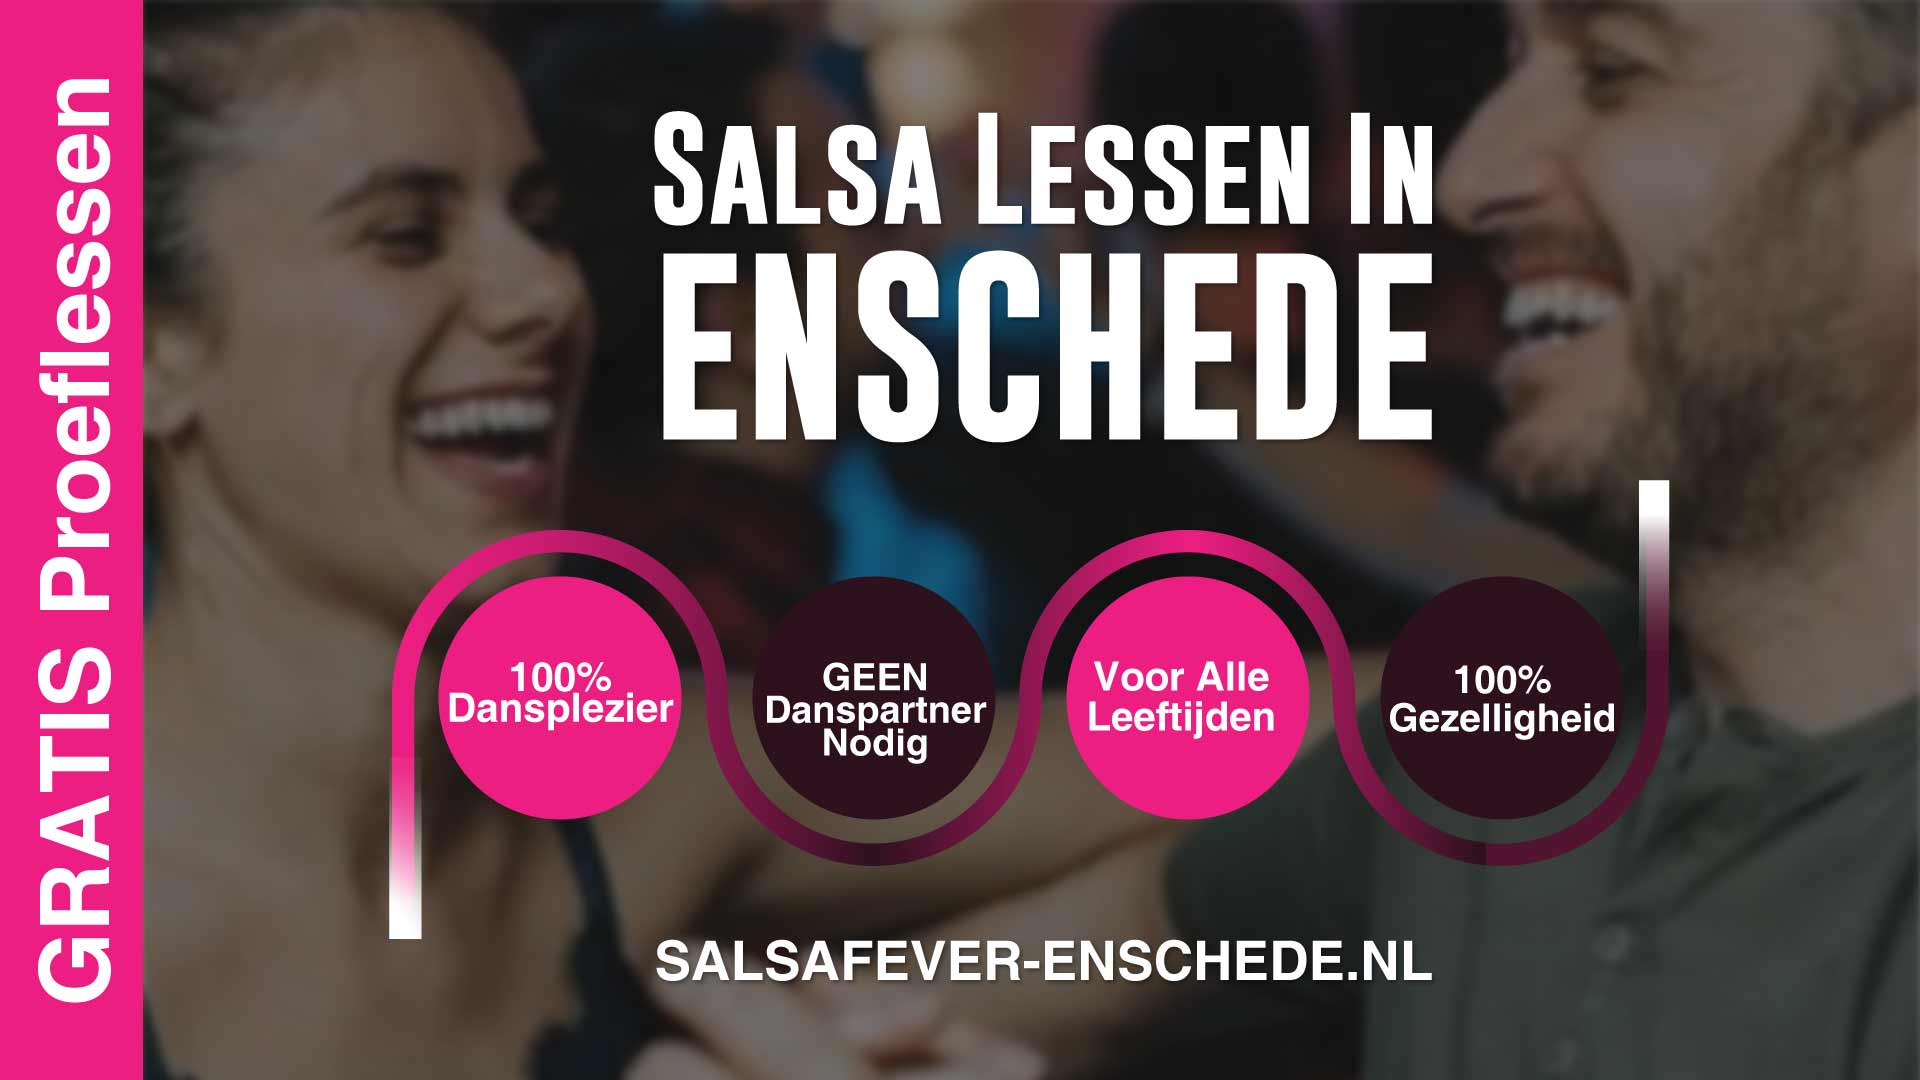 Salsa Enschede Salsa lessen Enschede Salsa lessen Salsa dansen Enschede Salsa Danslessen